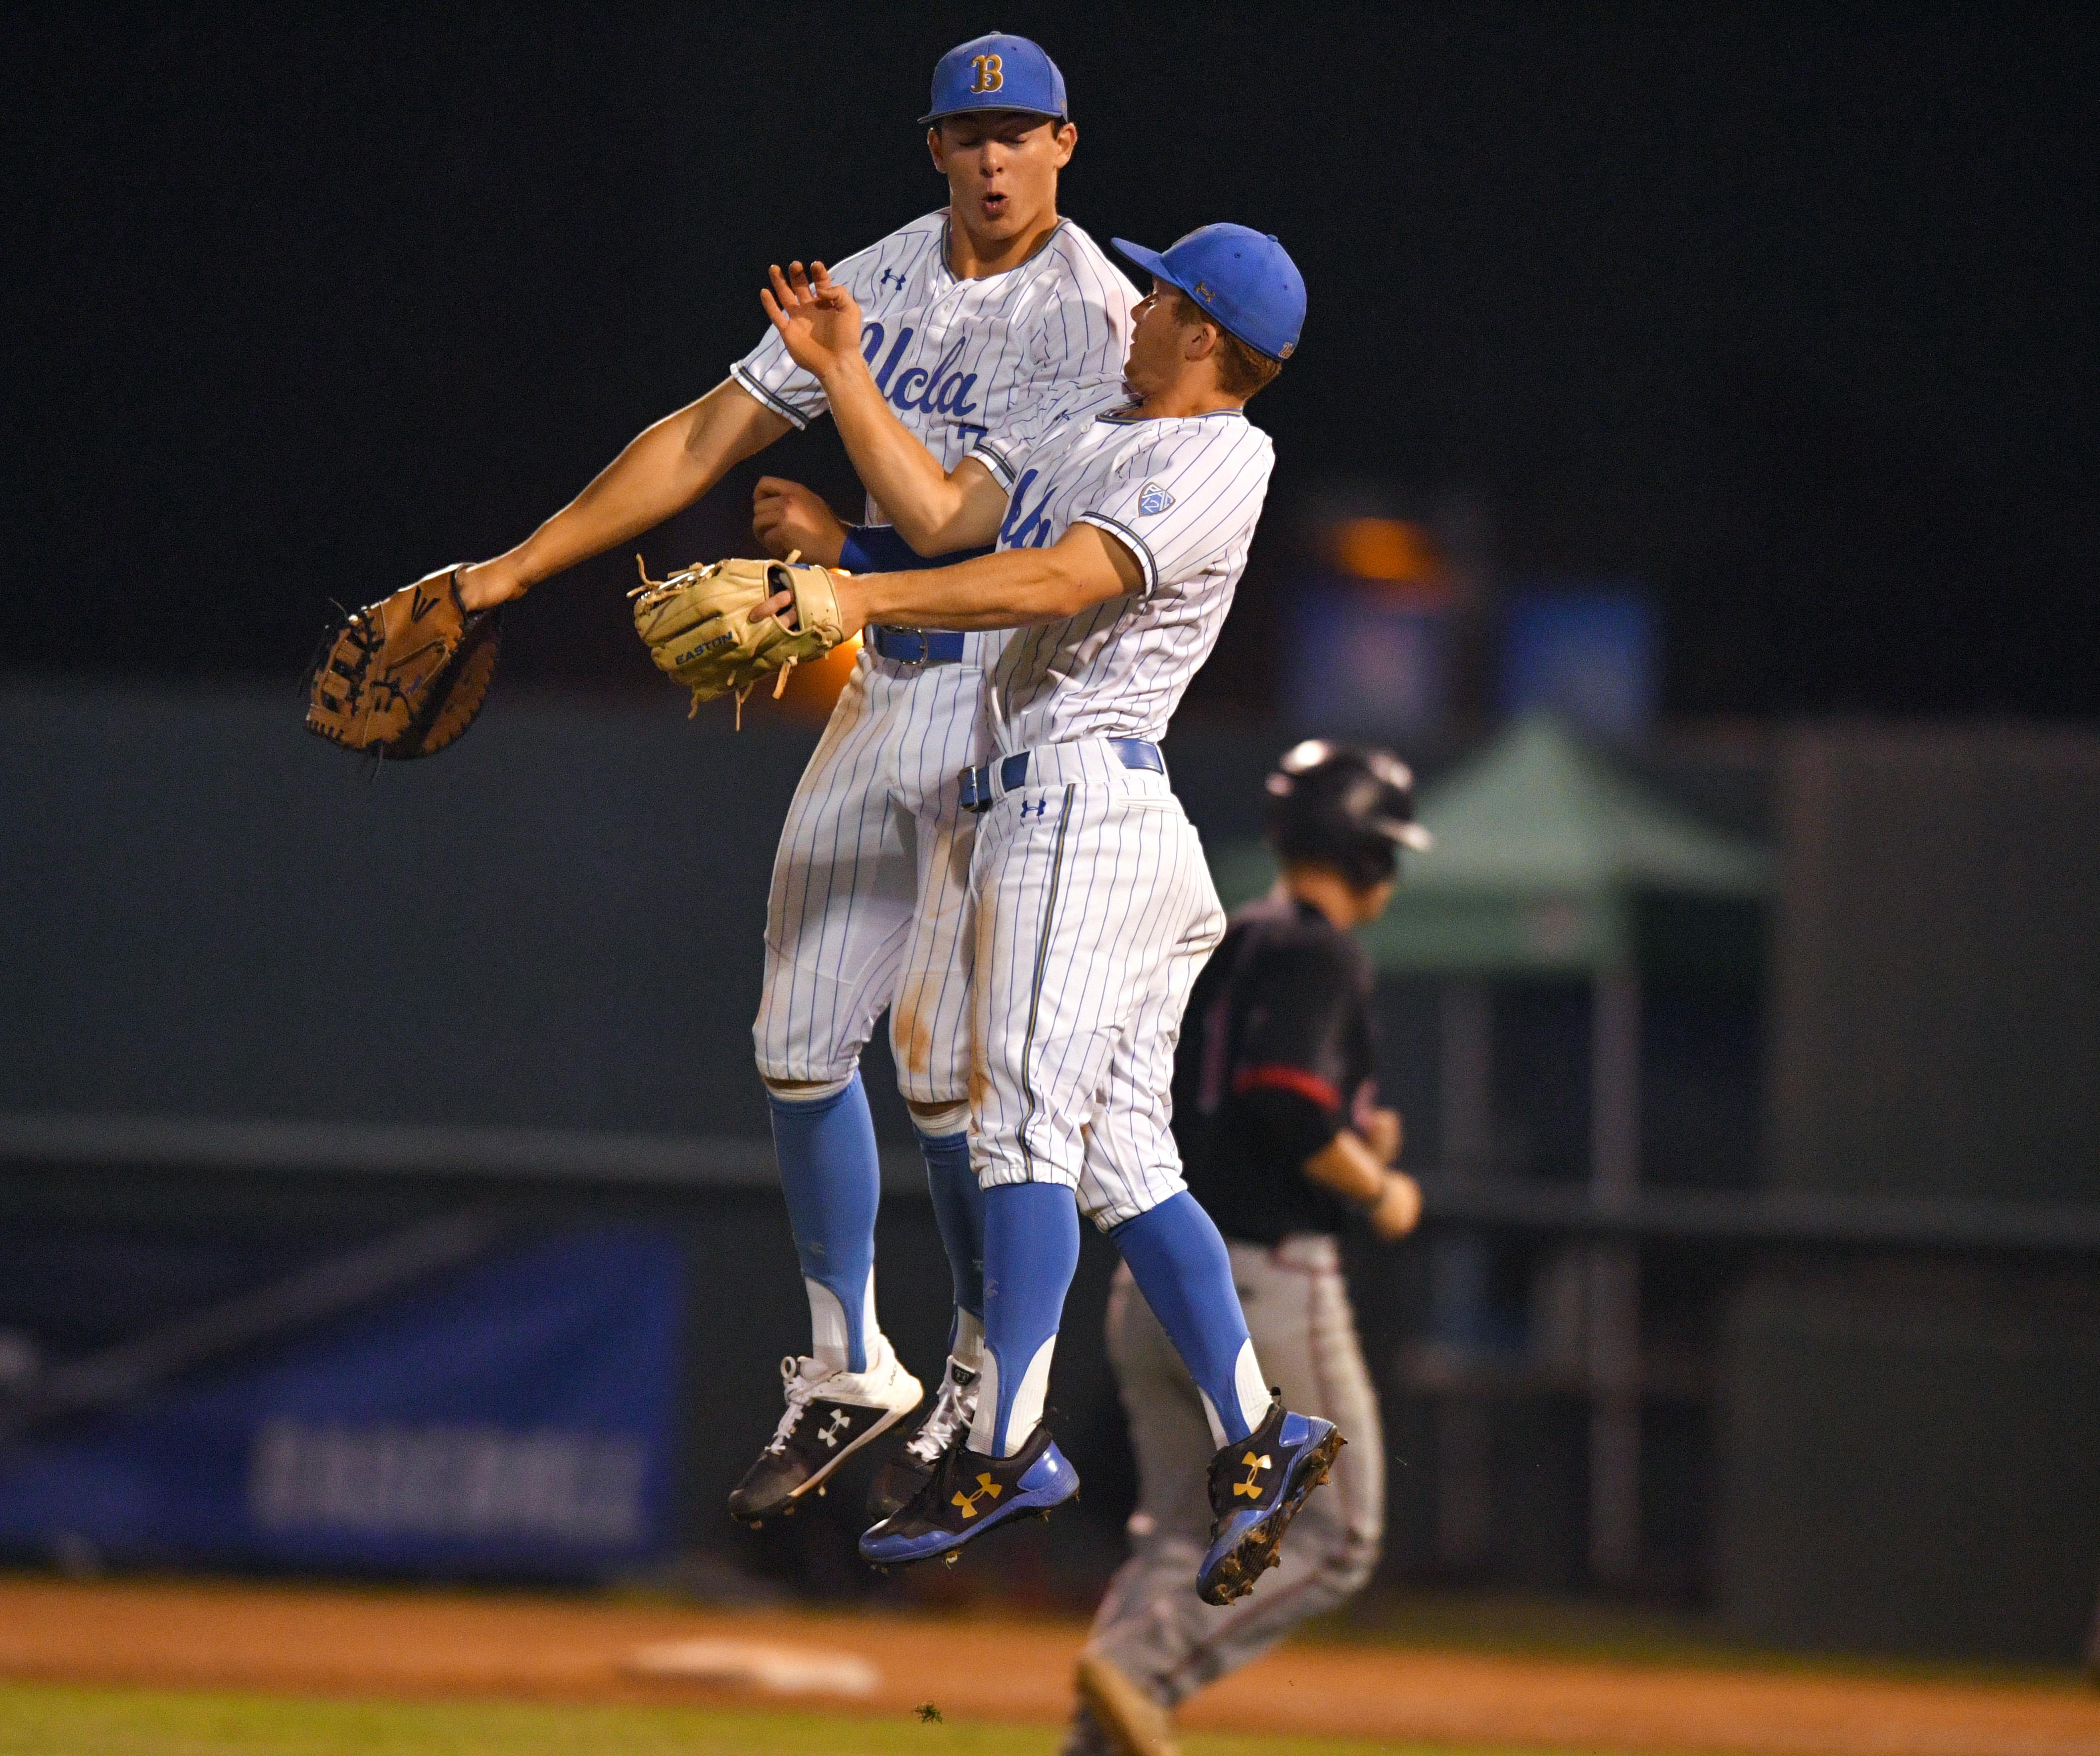 UCLA Baseball Beats Omaha 5-2